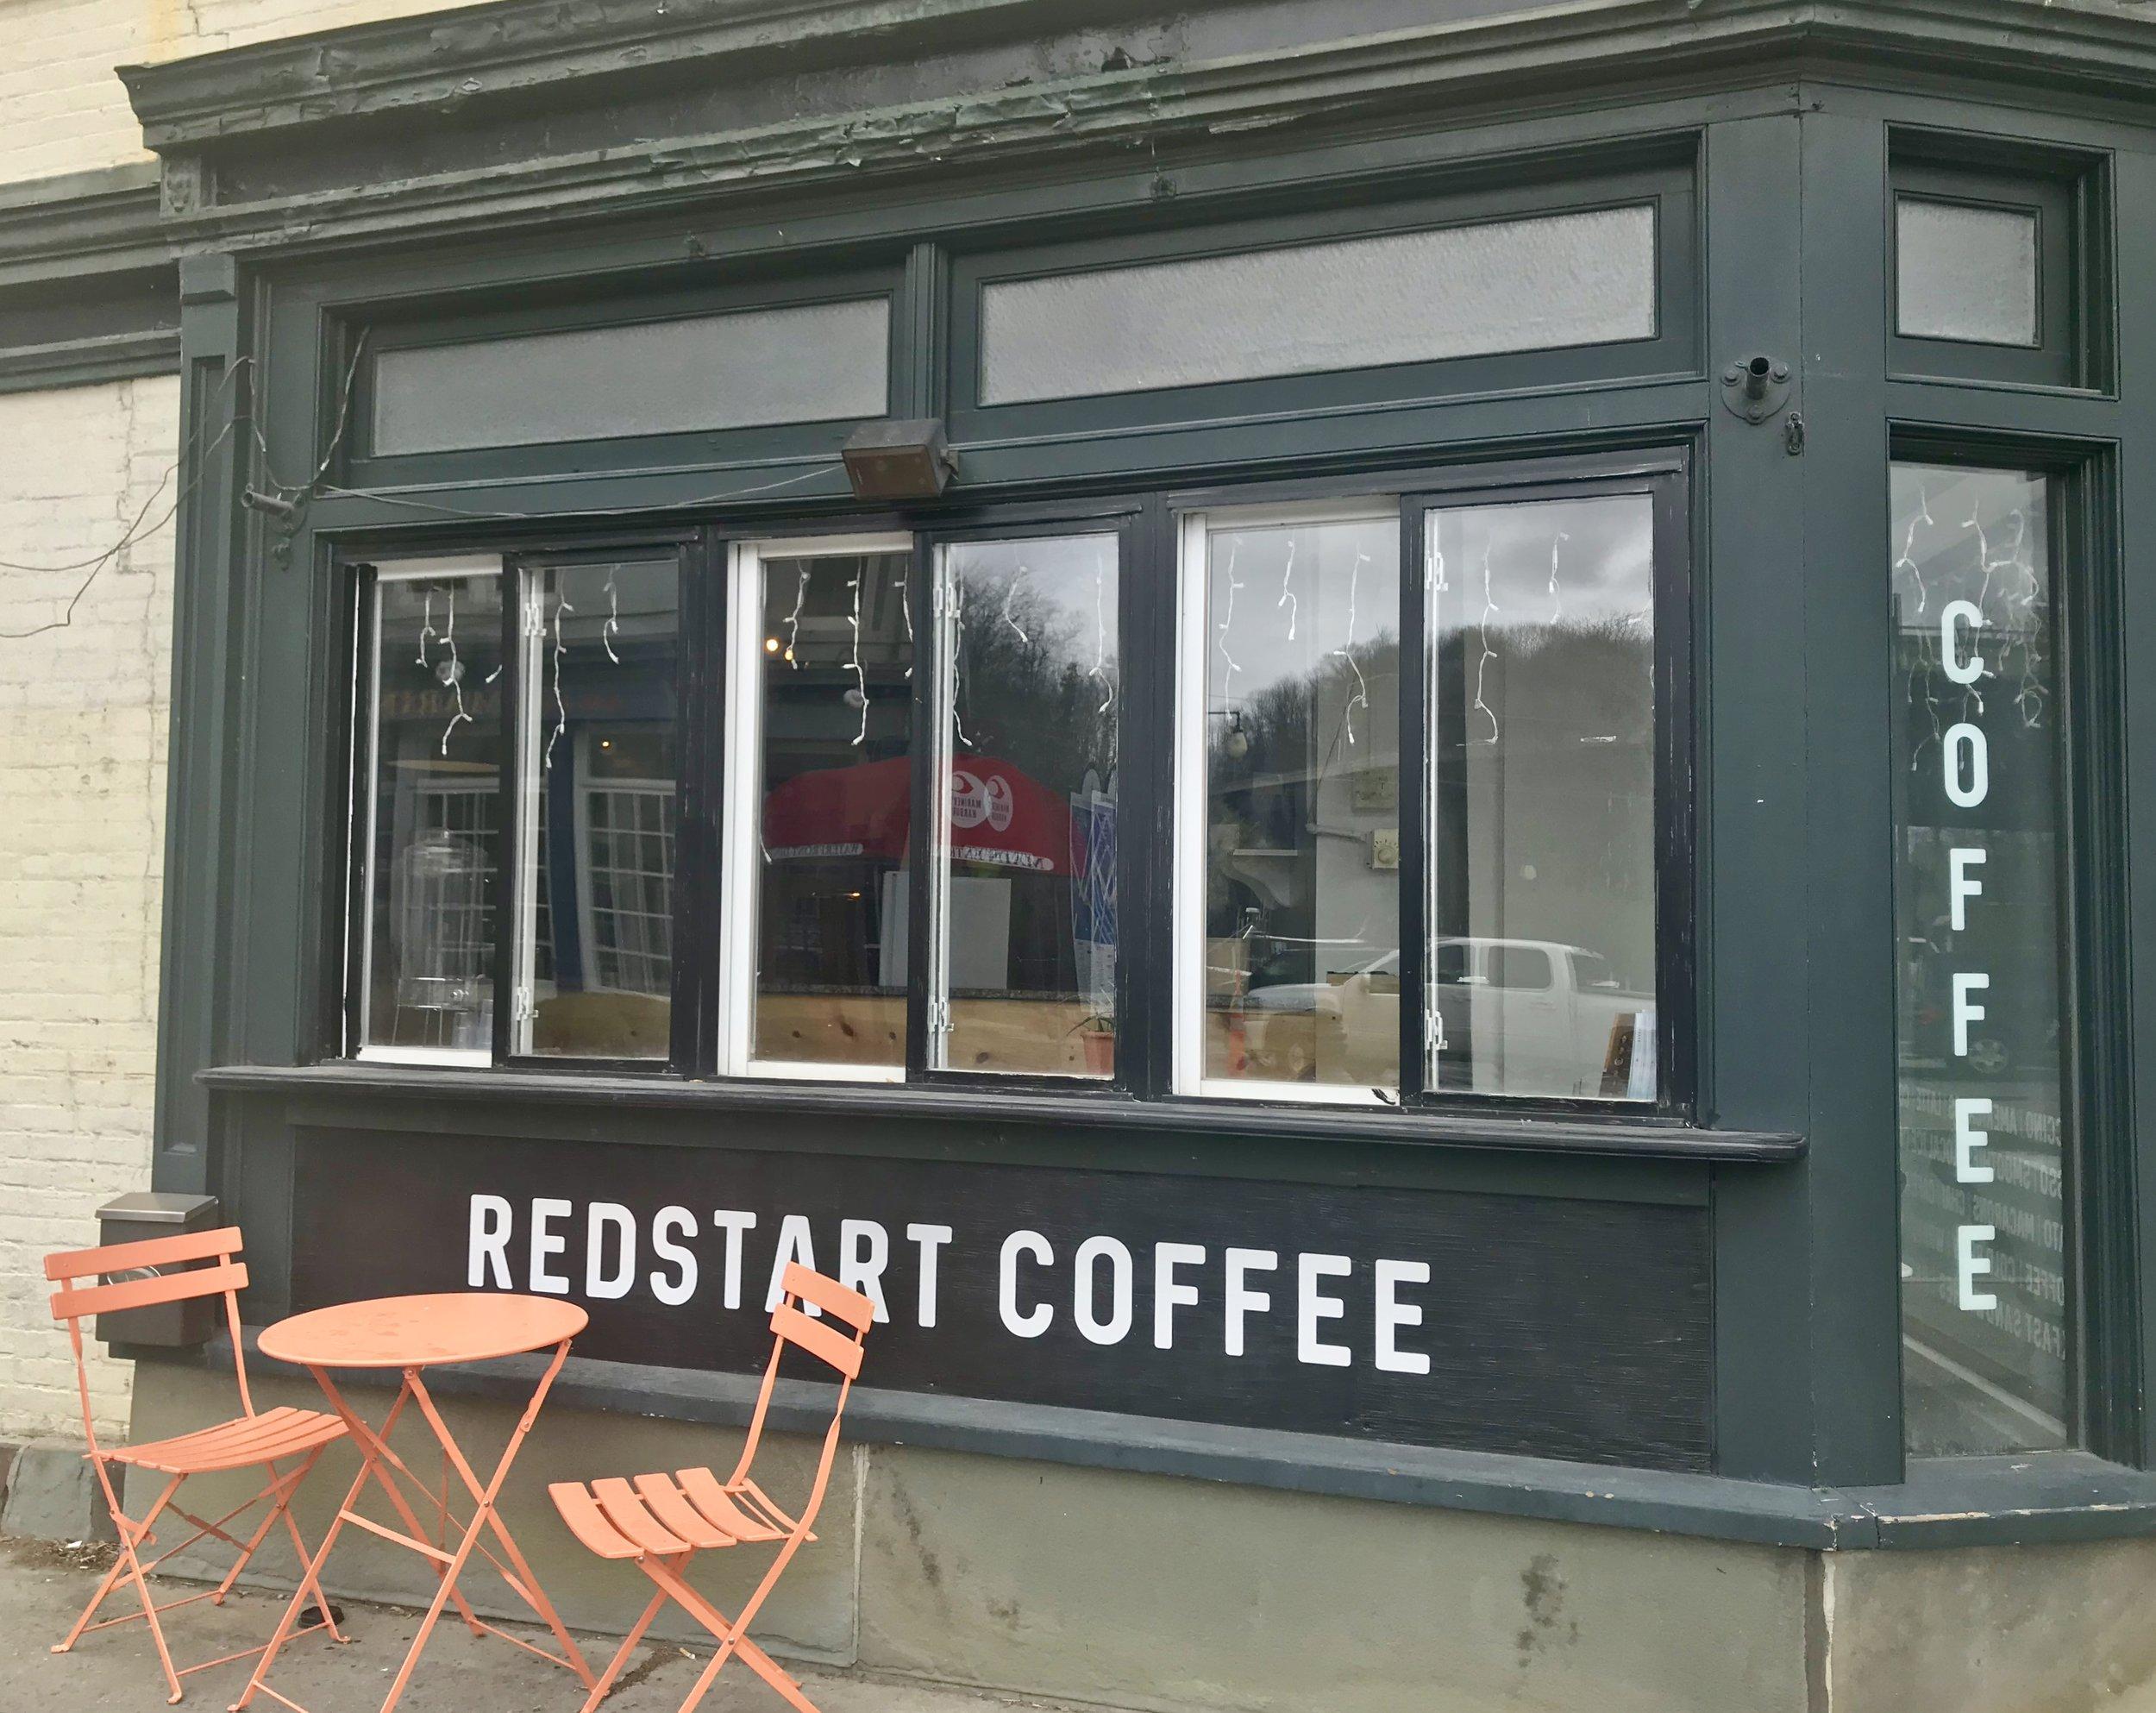 4. Redstart Coffee -